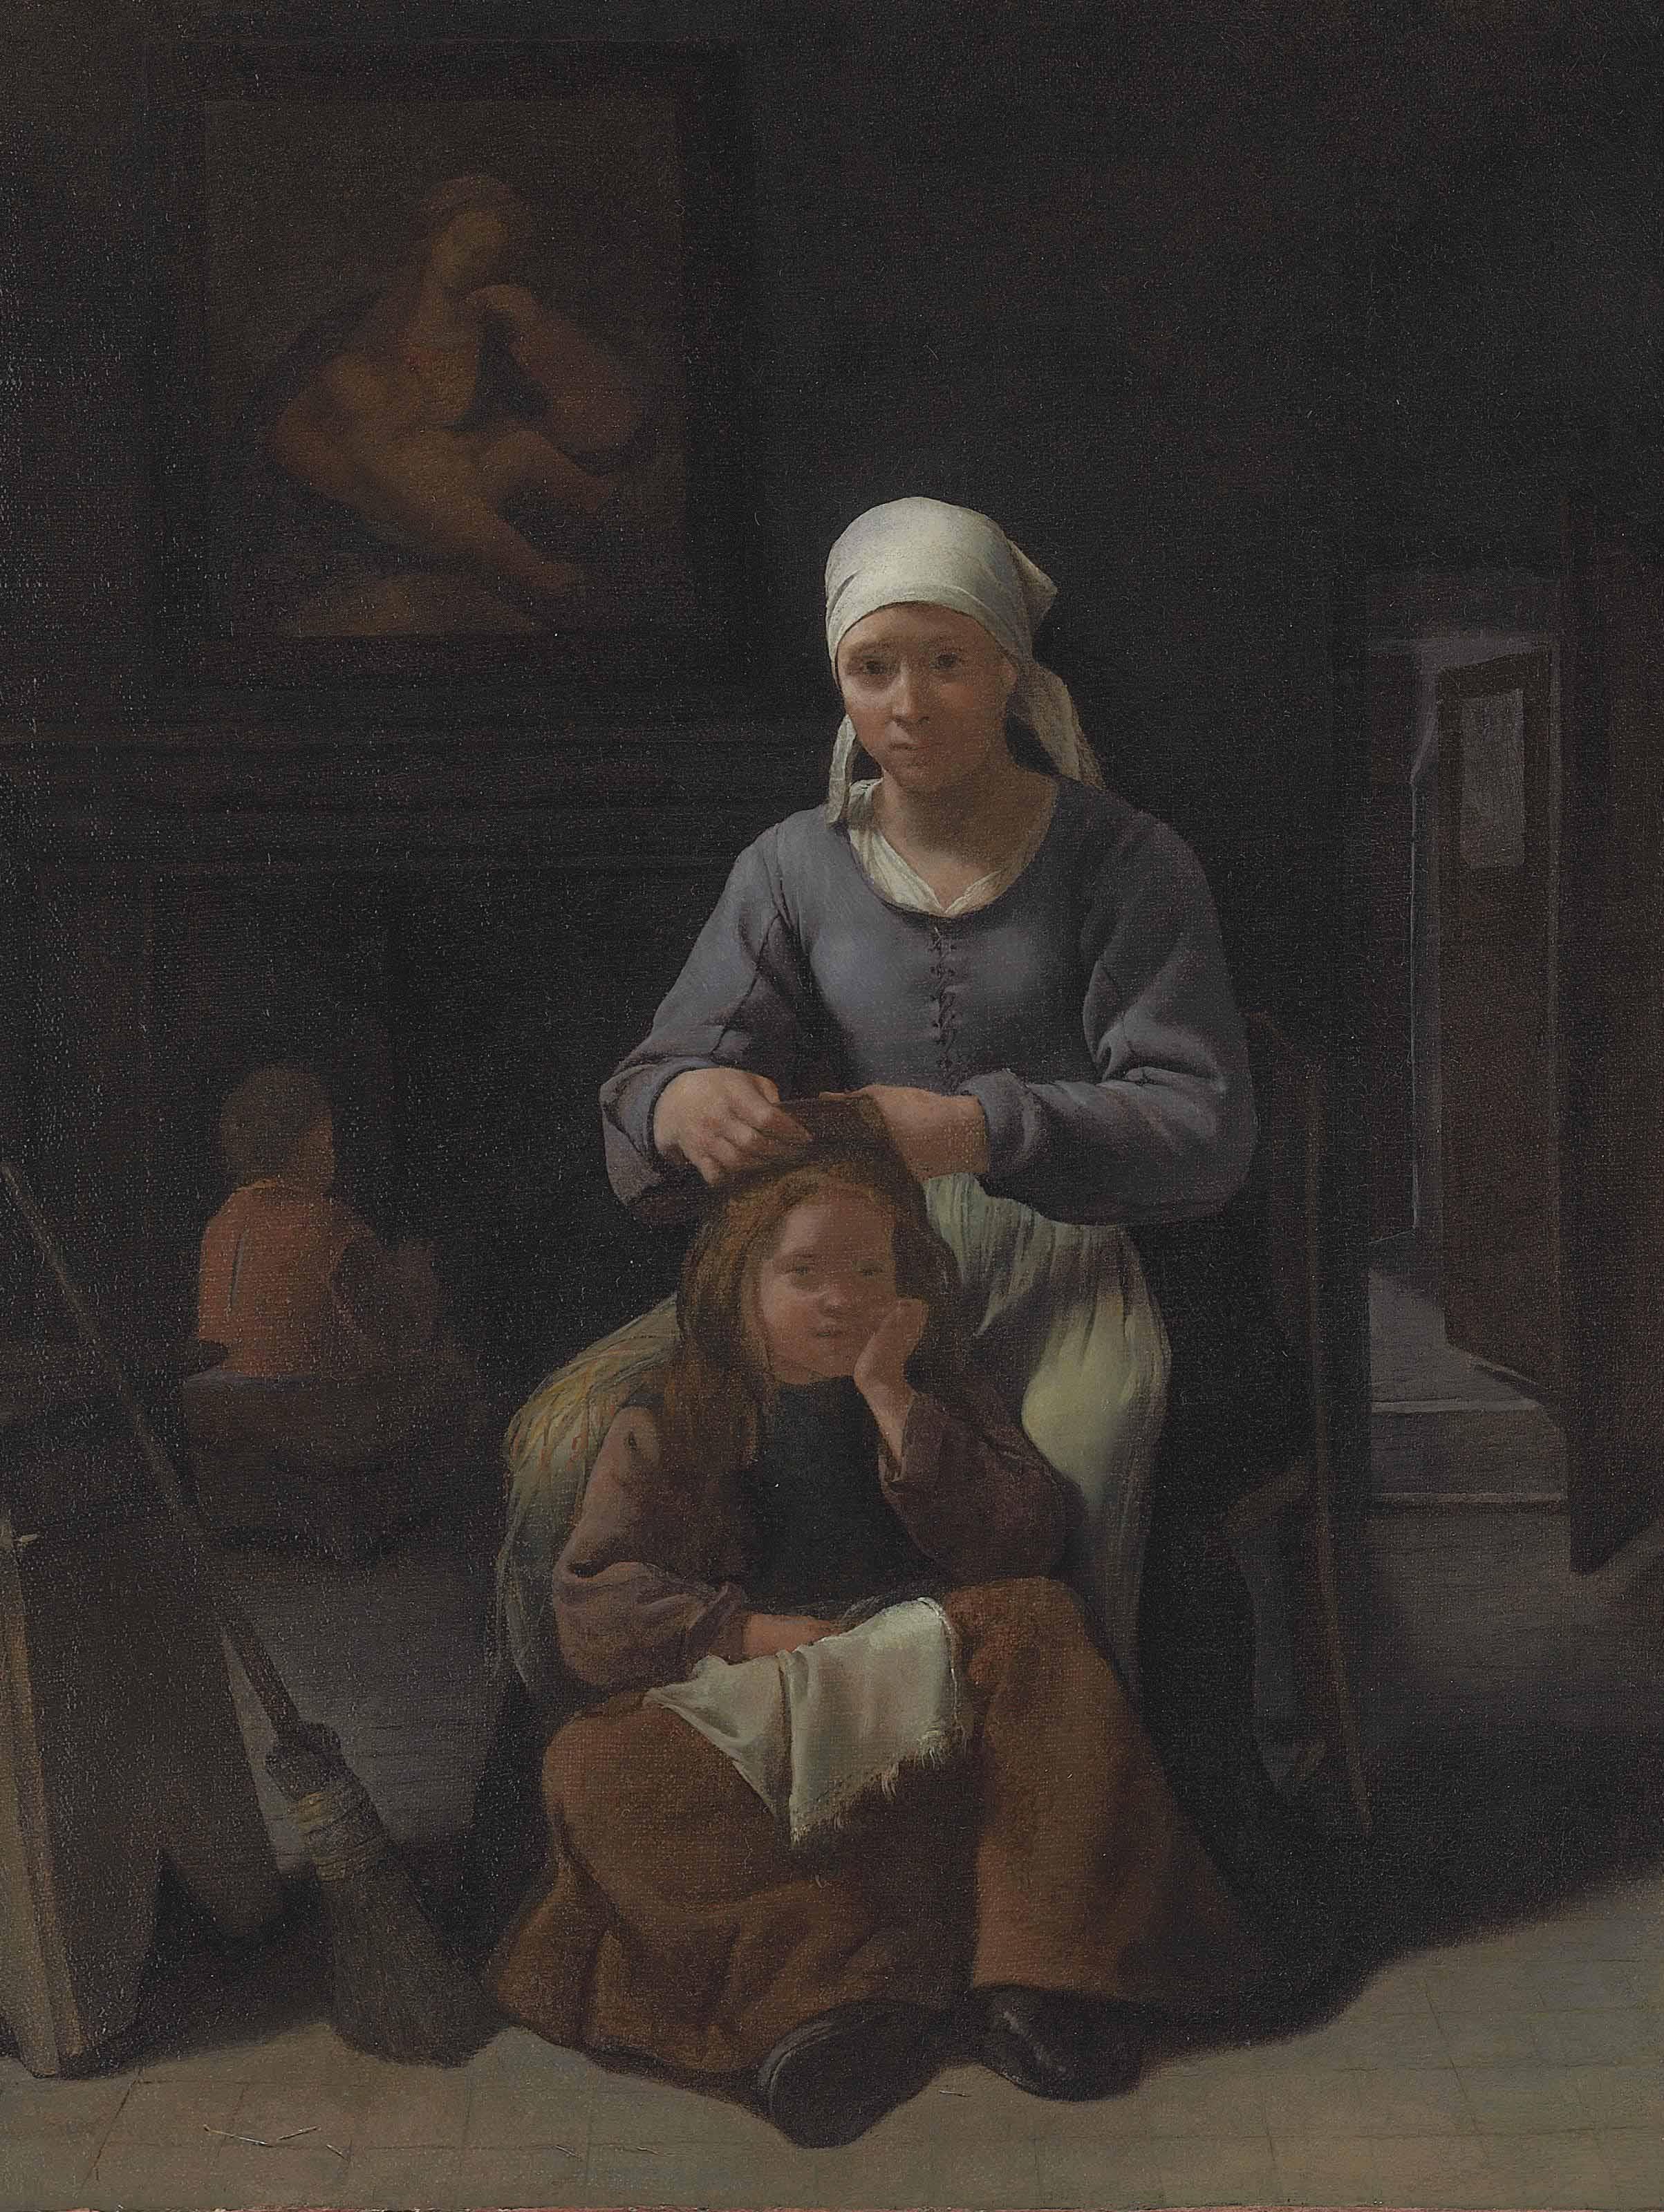 Michiel Sweerts (Brussels 1618